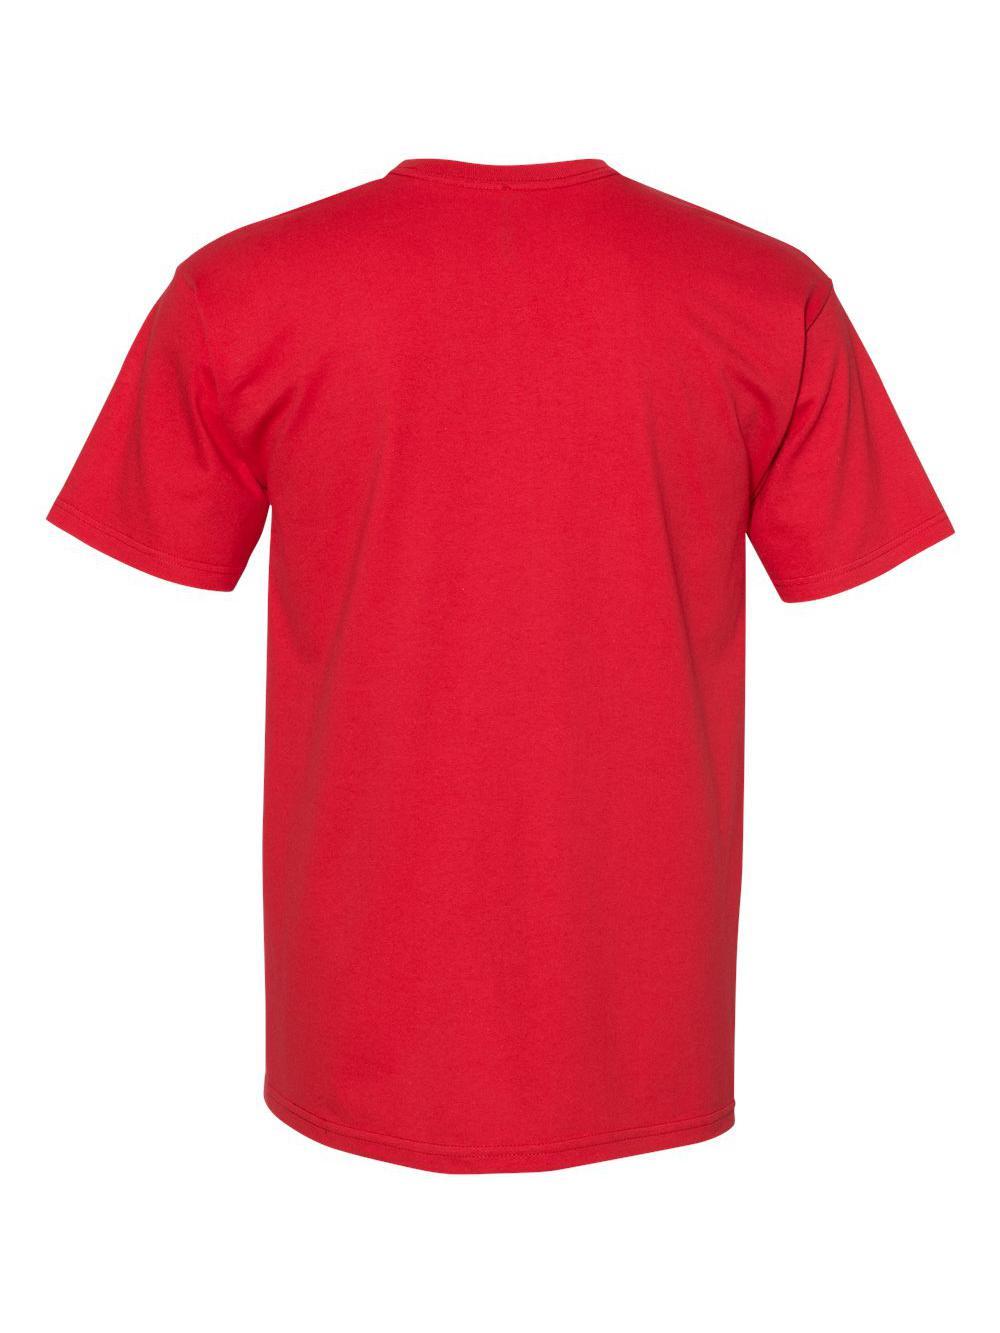 ALSTYLE-Premium-T-Shirt-1701 thumbnail 44